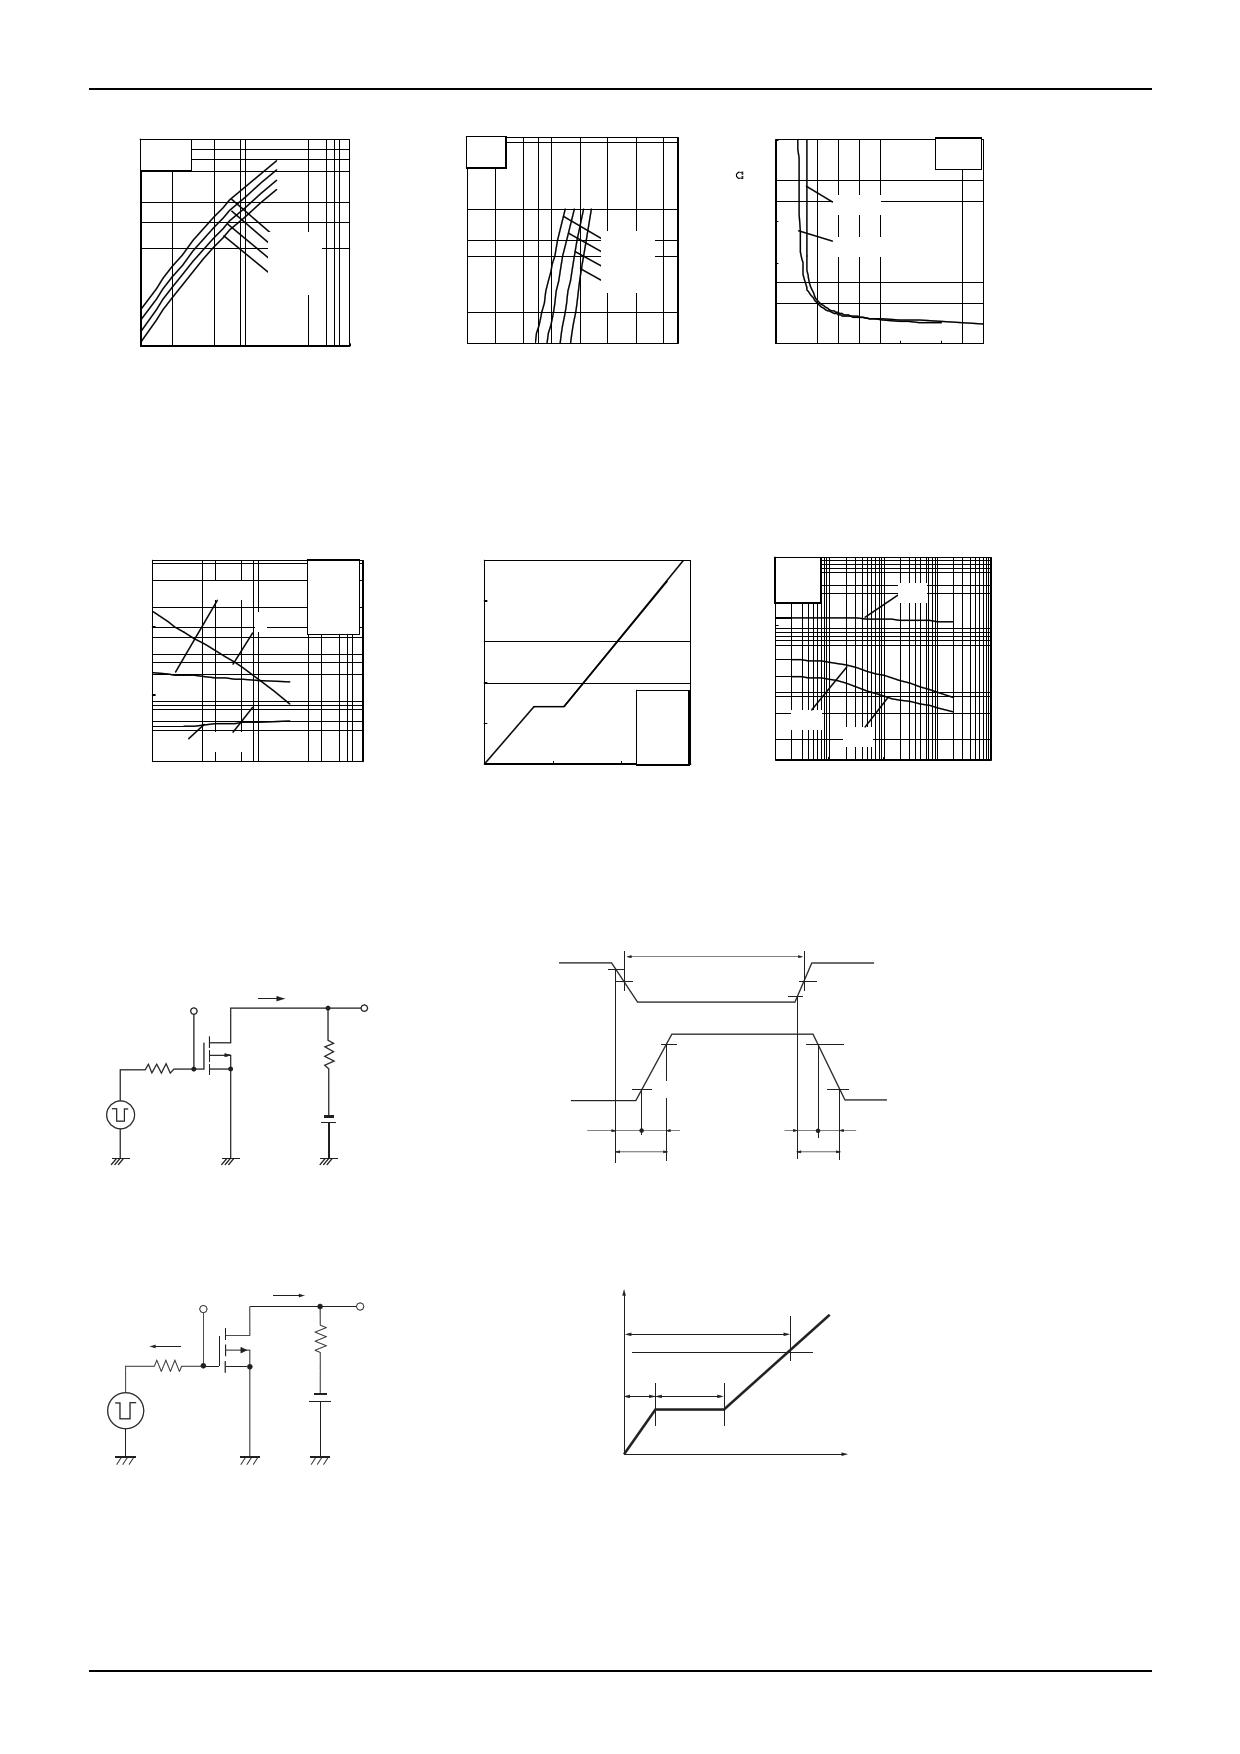 EM6J1 pdf, 전자부품, 반도체, 판매, 대치품